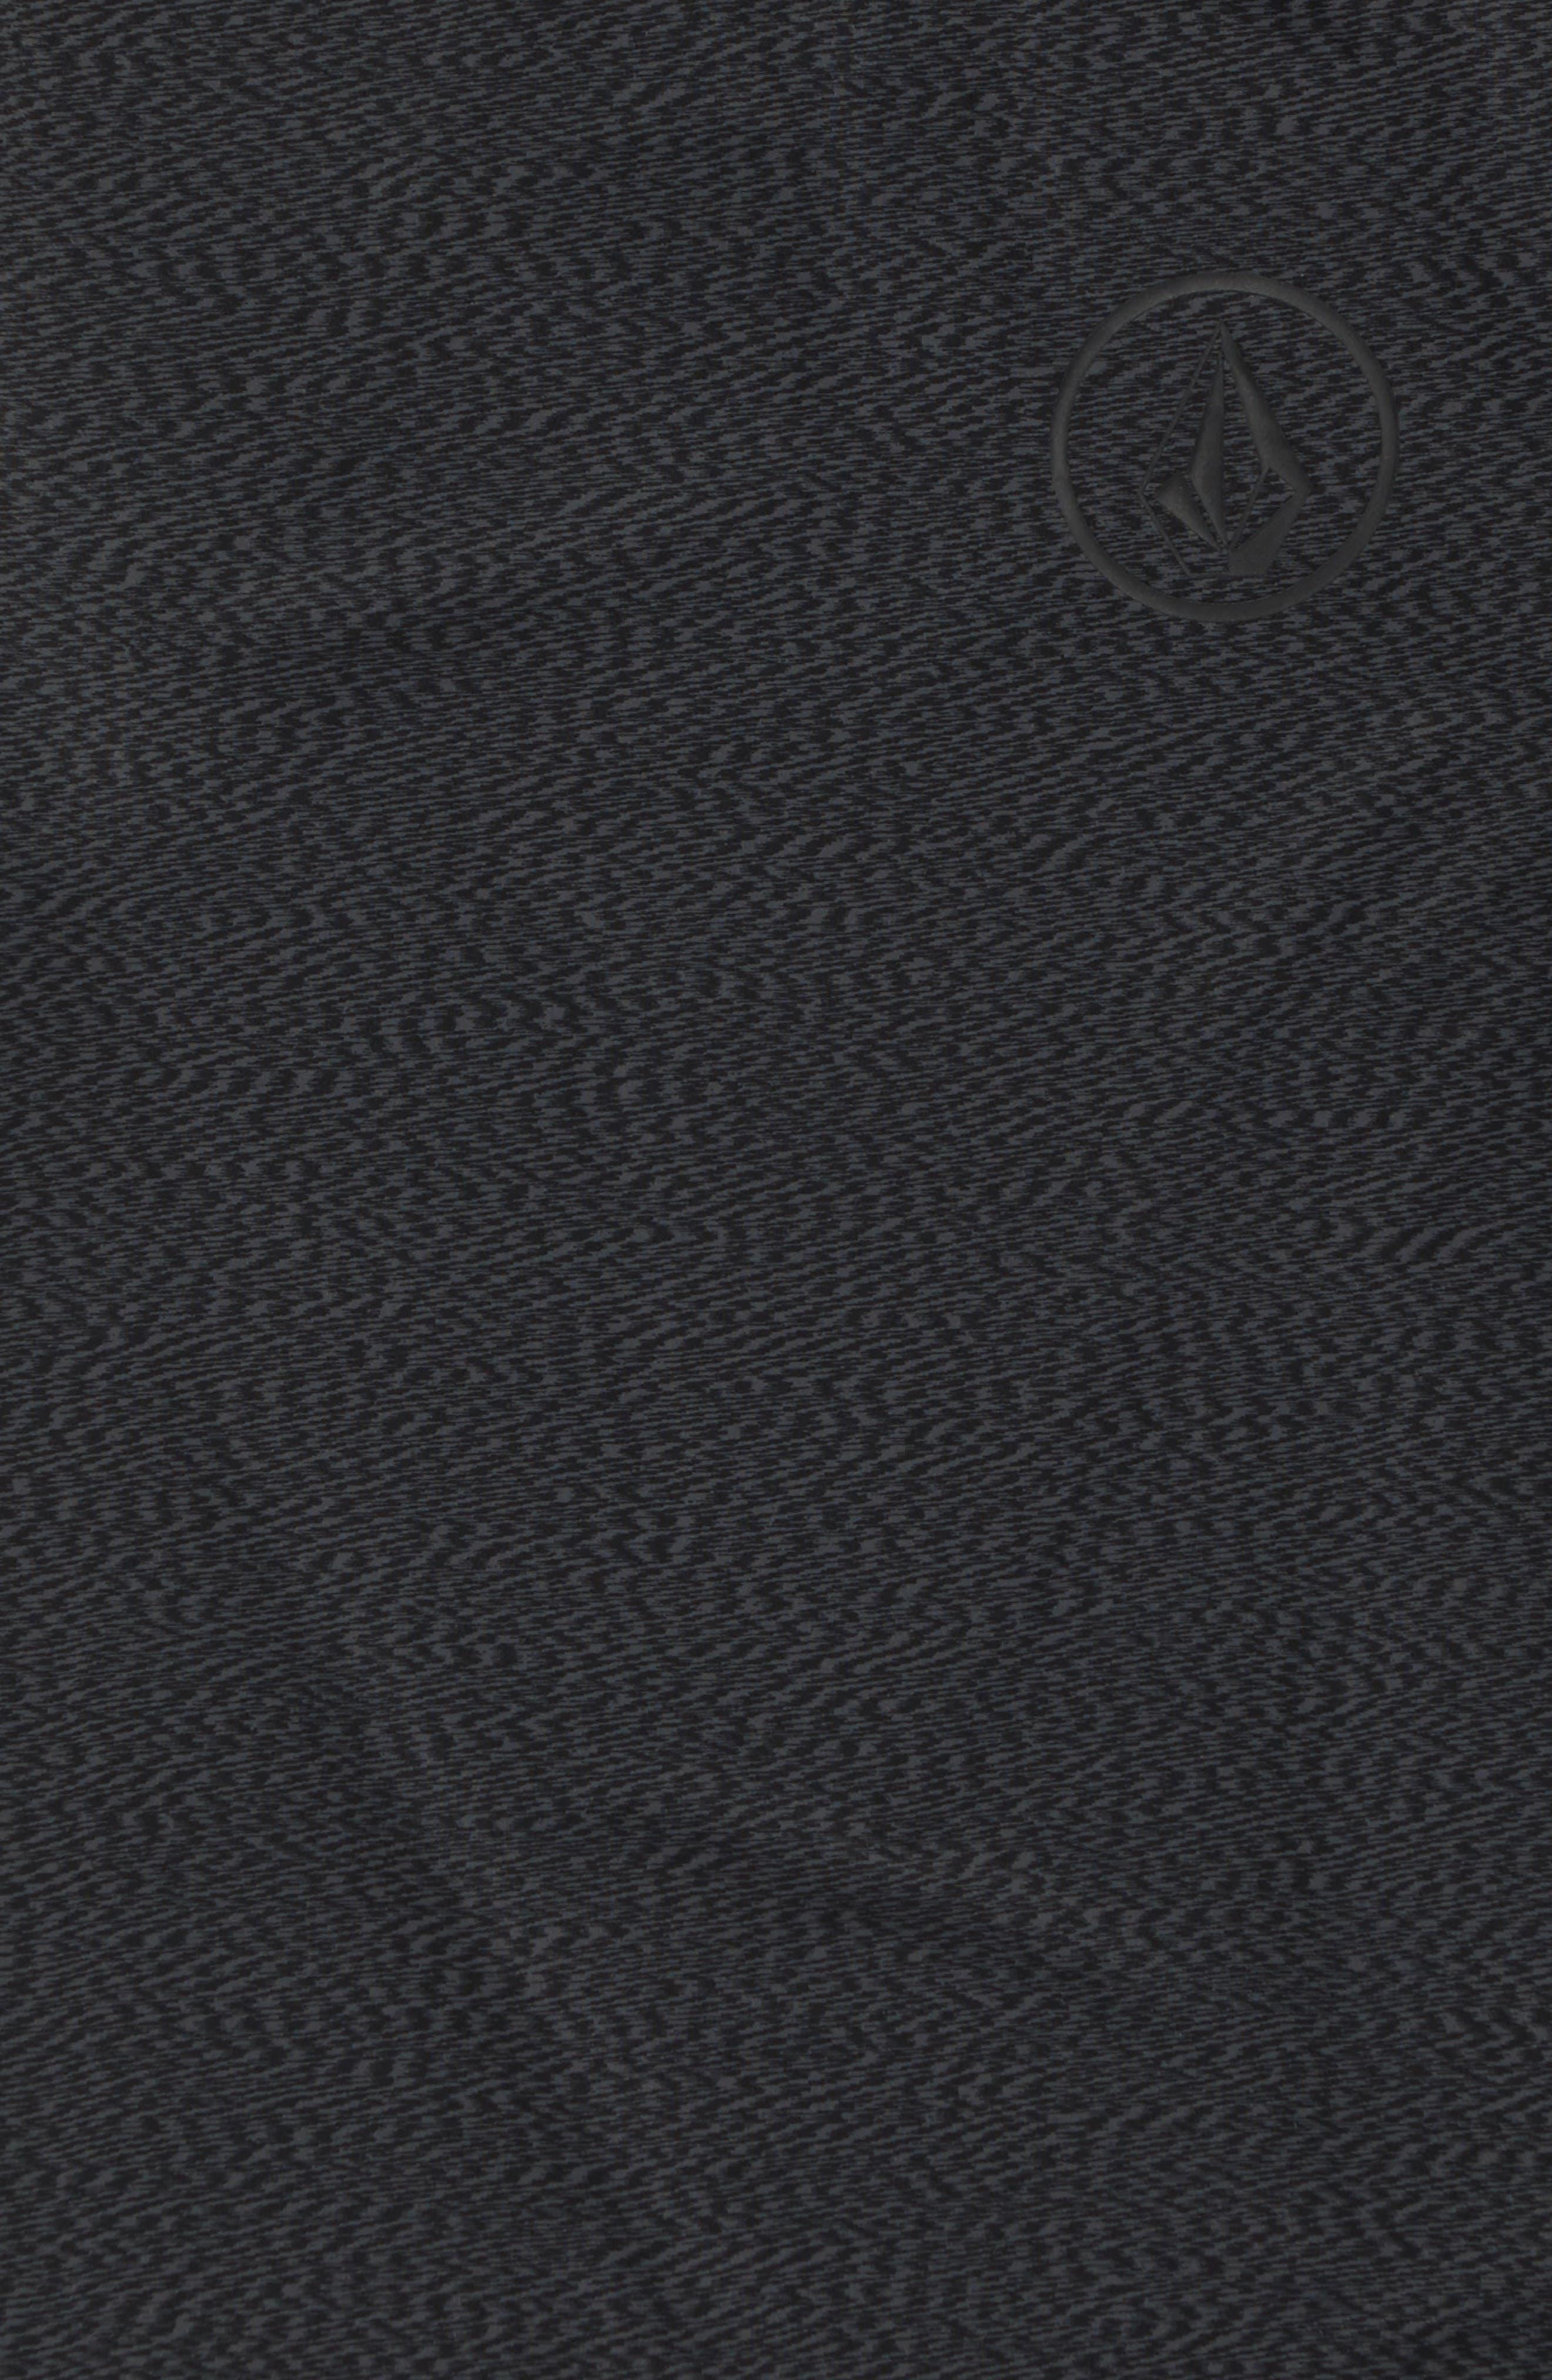 Thrashguard Distortion Rashguard,                             Alternate thumbnail 2, color,                             Stealth Grey